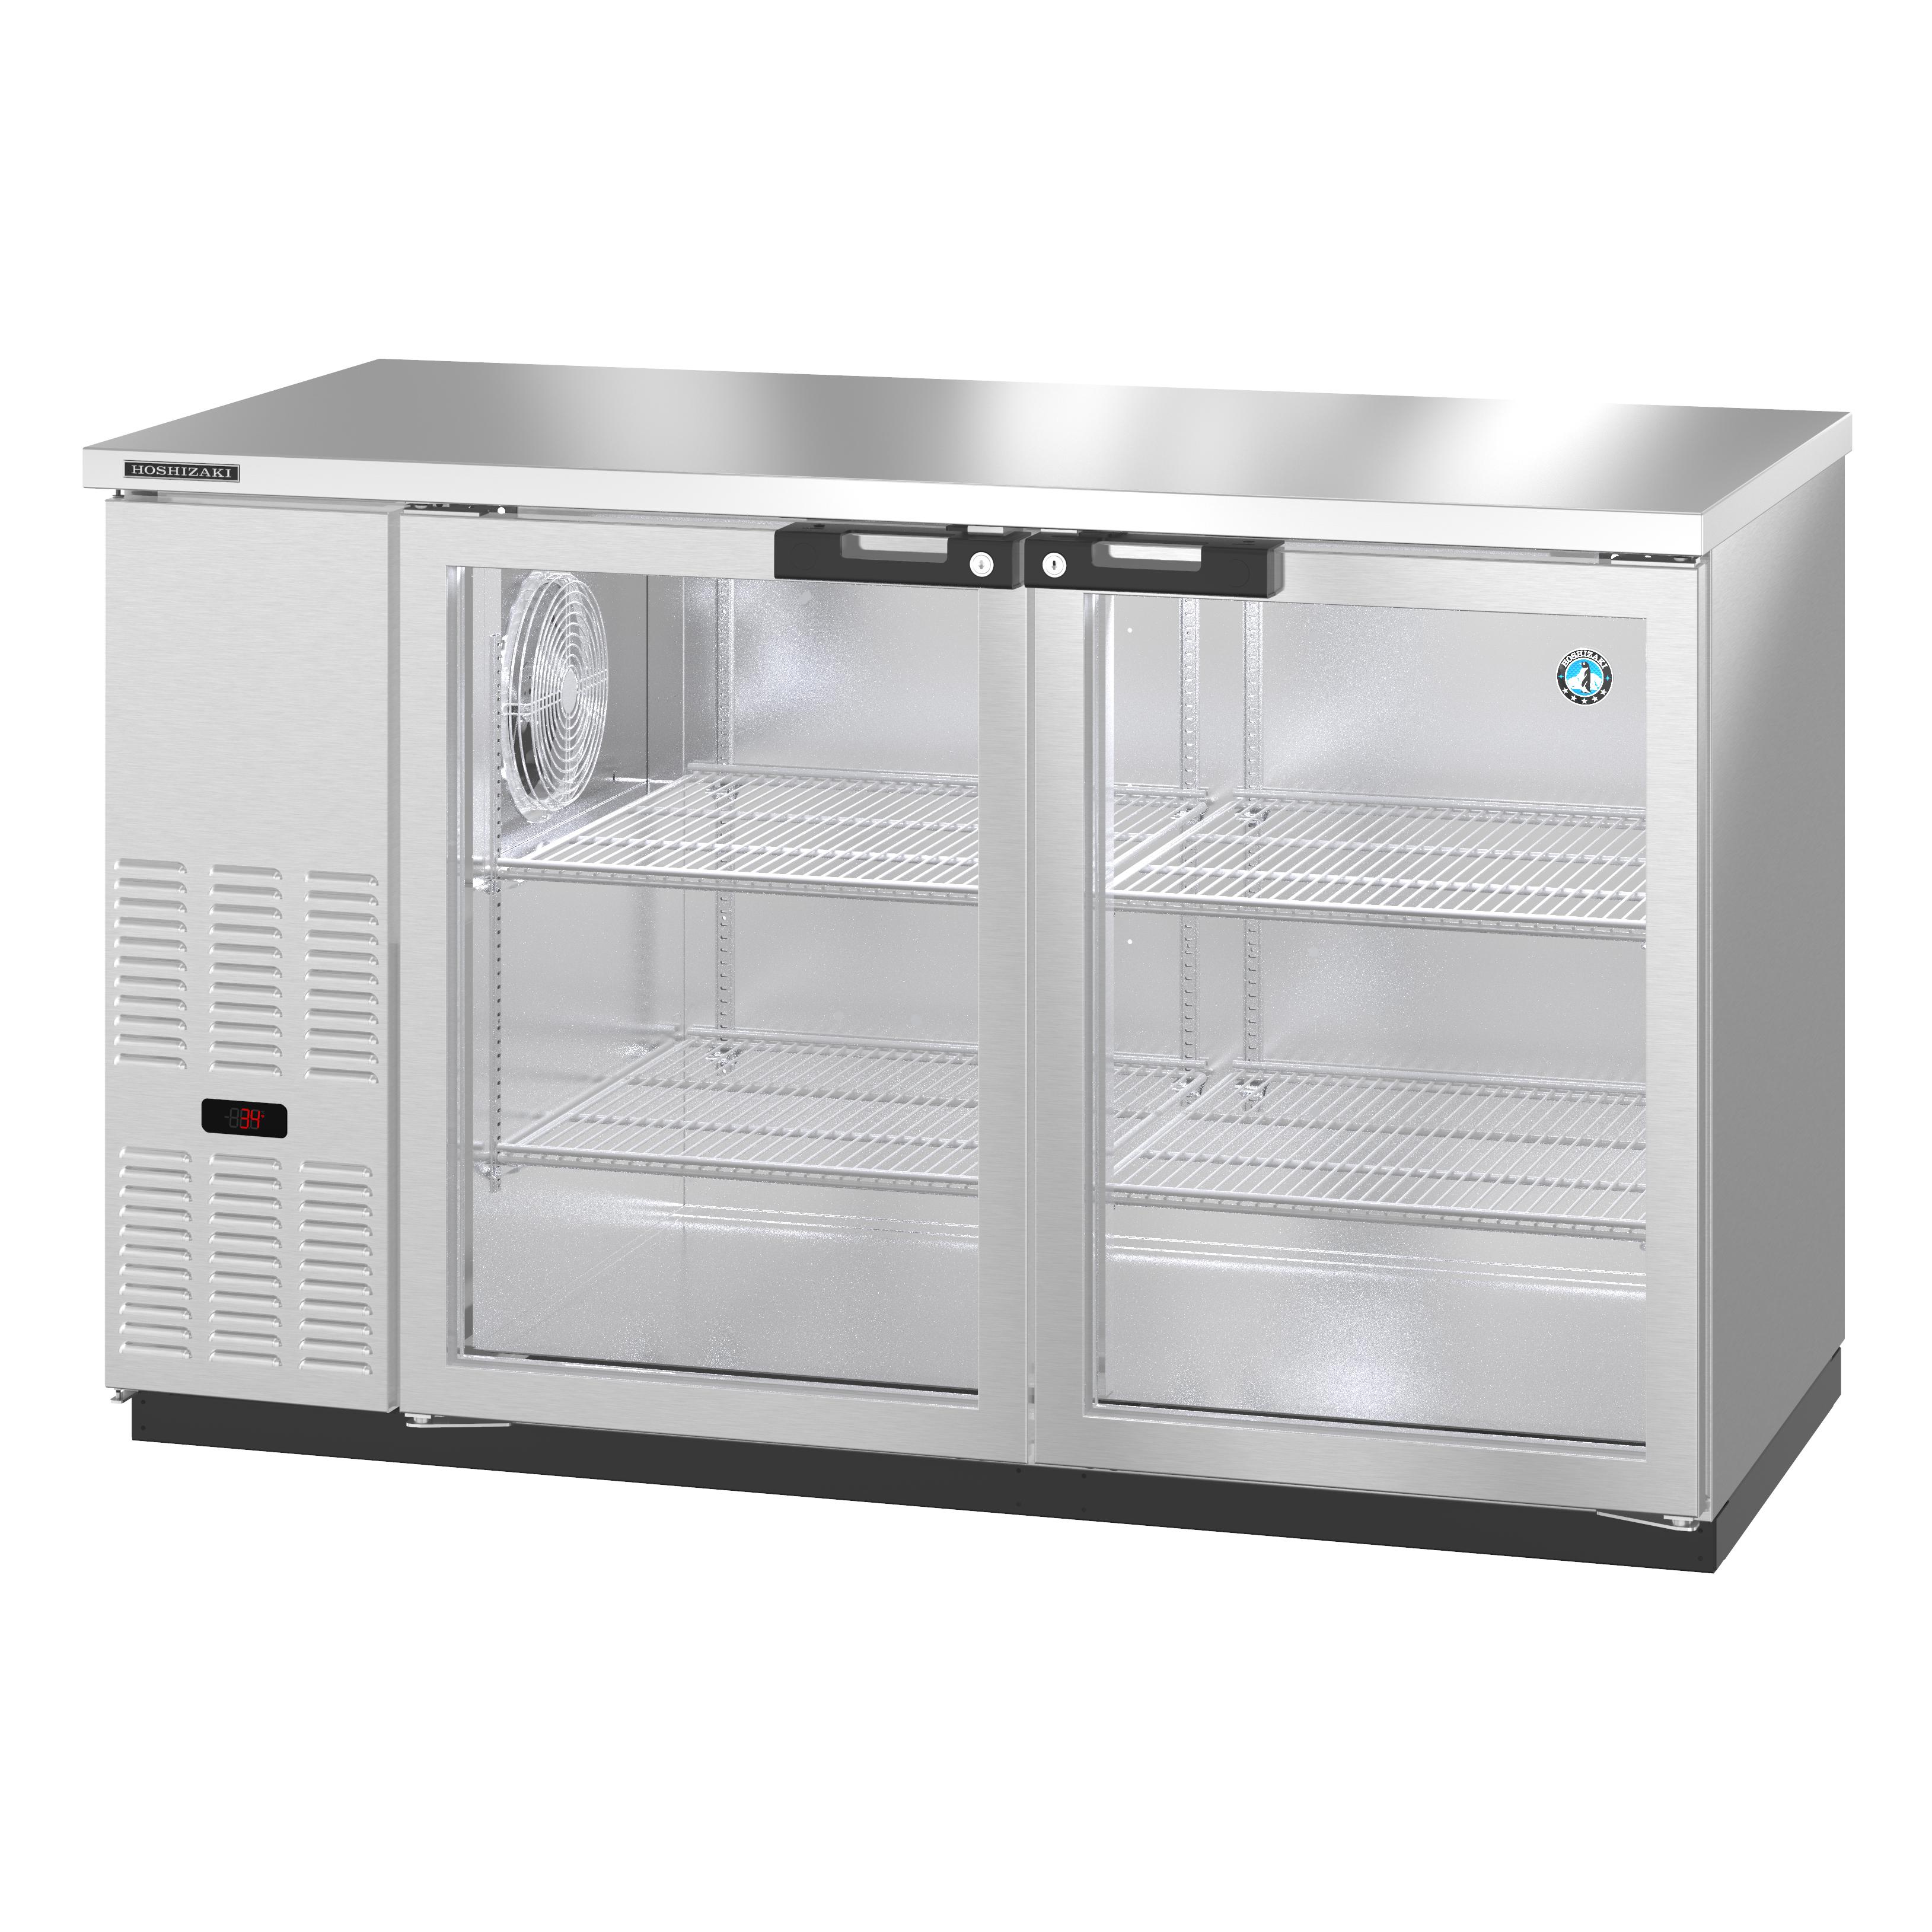 Hoshizaki BB59-G-S underbar equipment/refrigeration